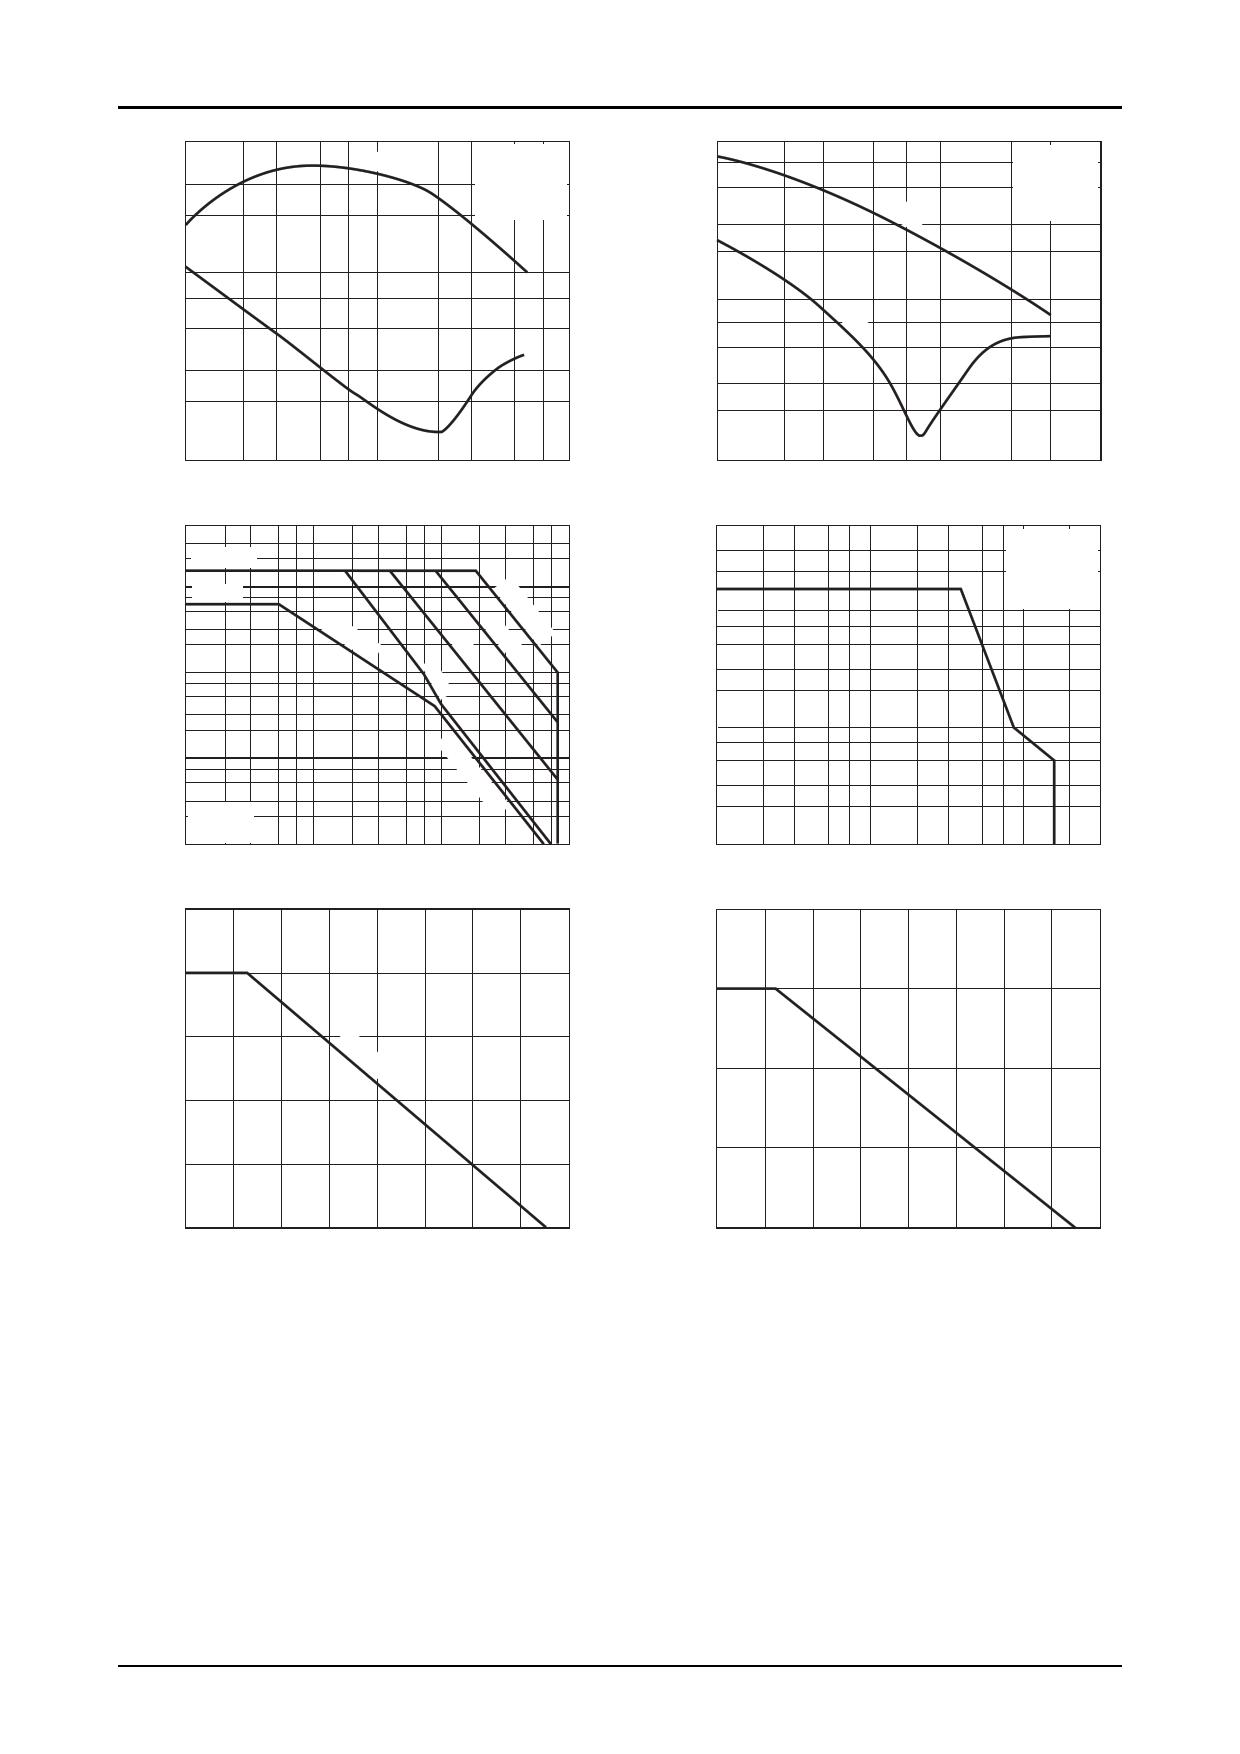 TT2140LS pdf, ピン配列